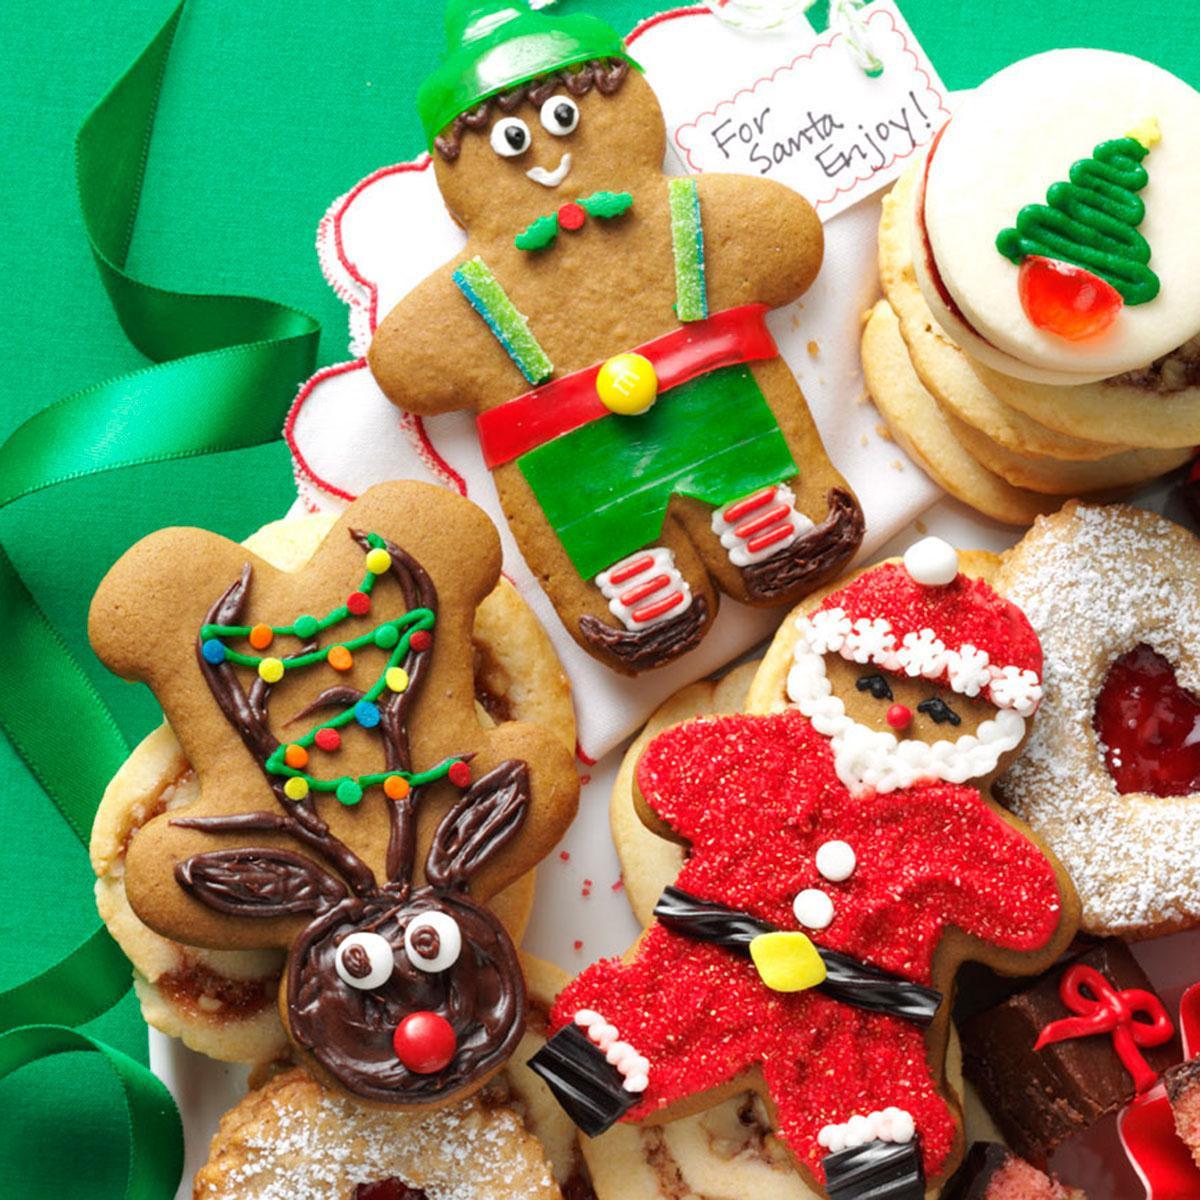 Taste Of Home Christmas Cookies  Gingerbread Cutout Christmas Cookies Recipe